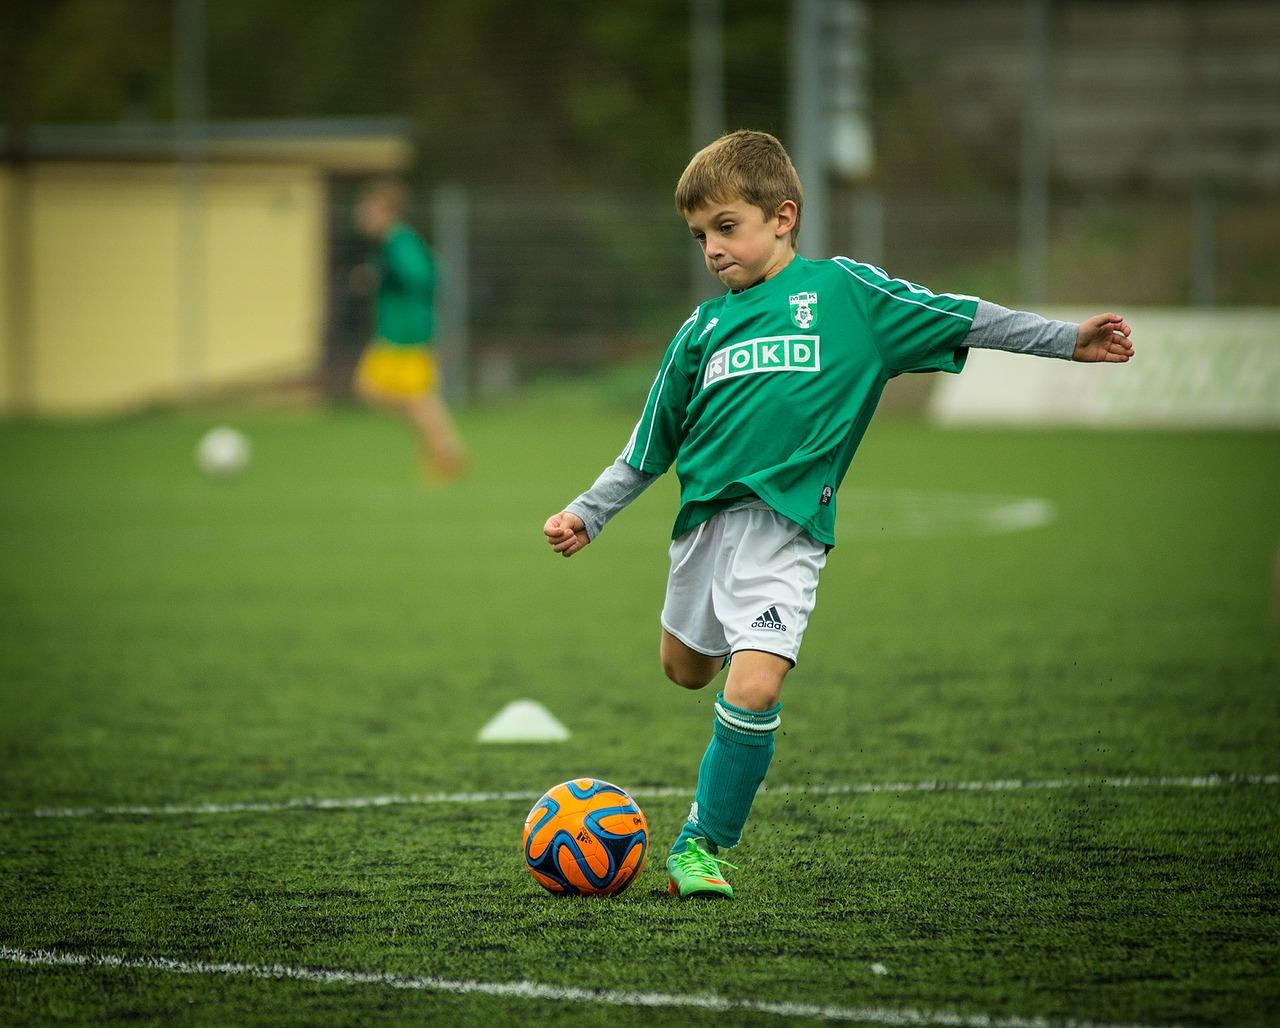 Sport giusto per bambini